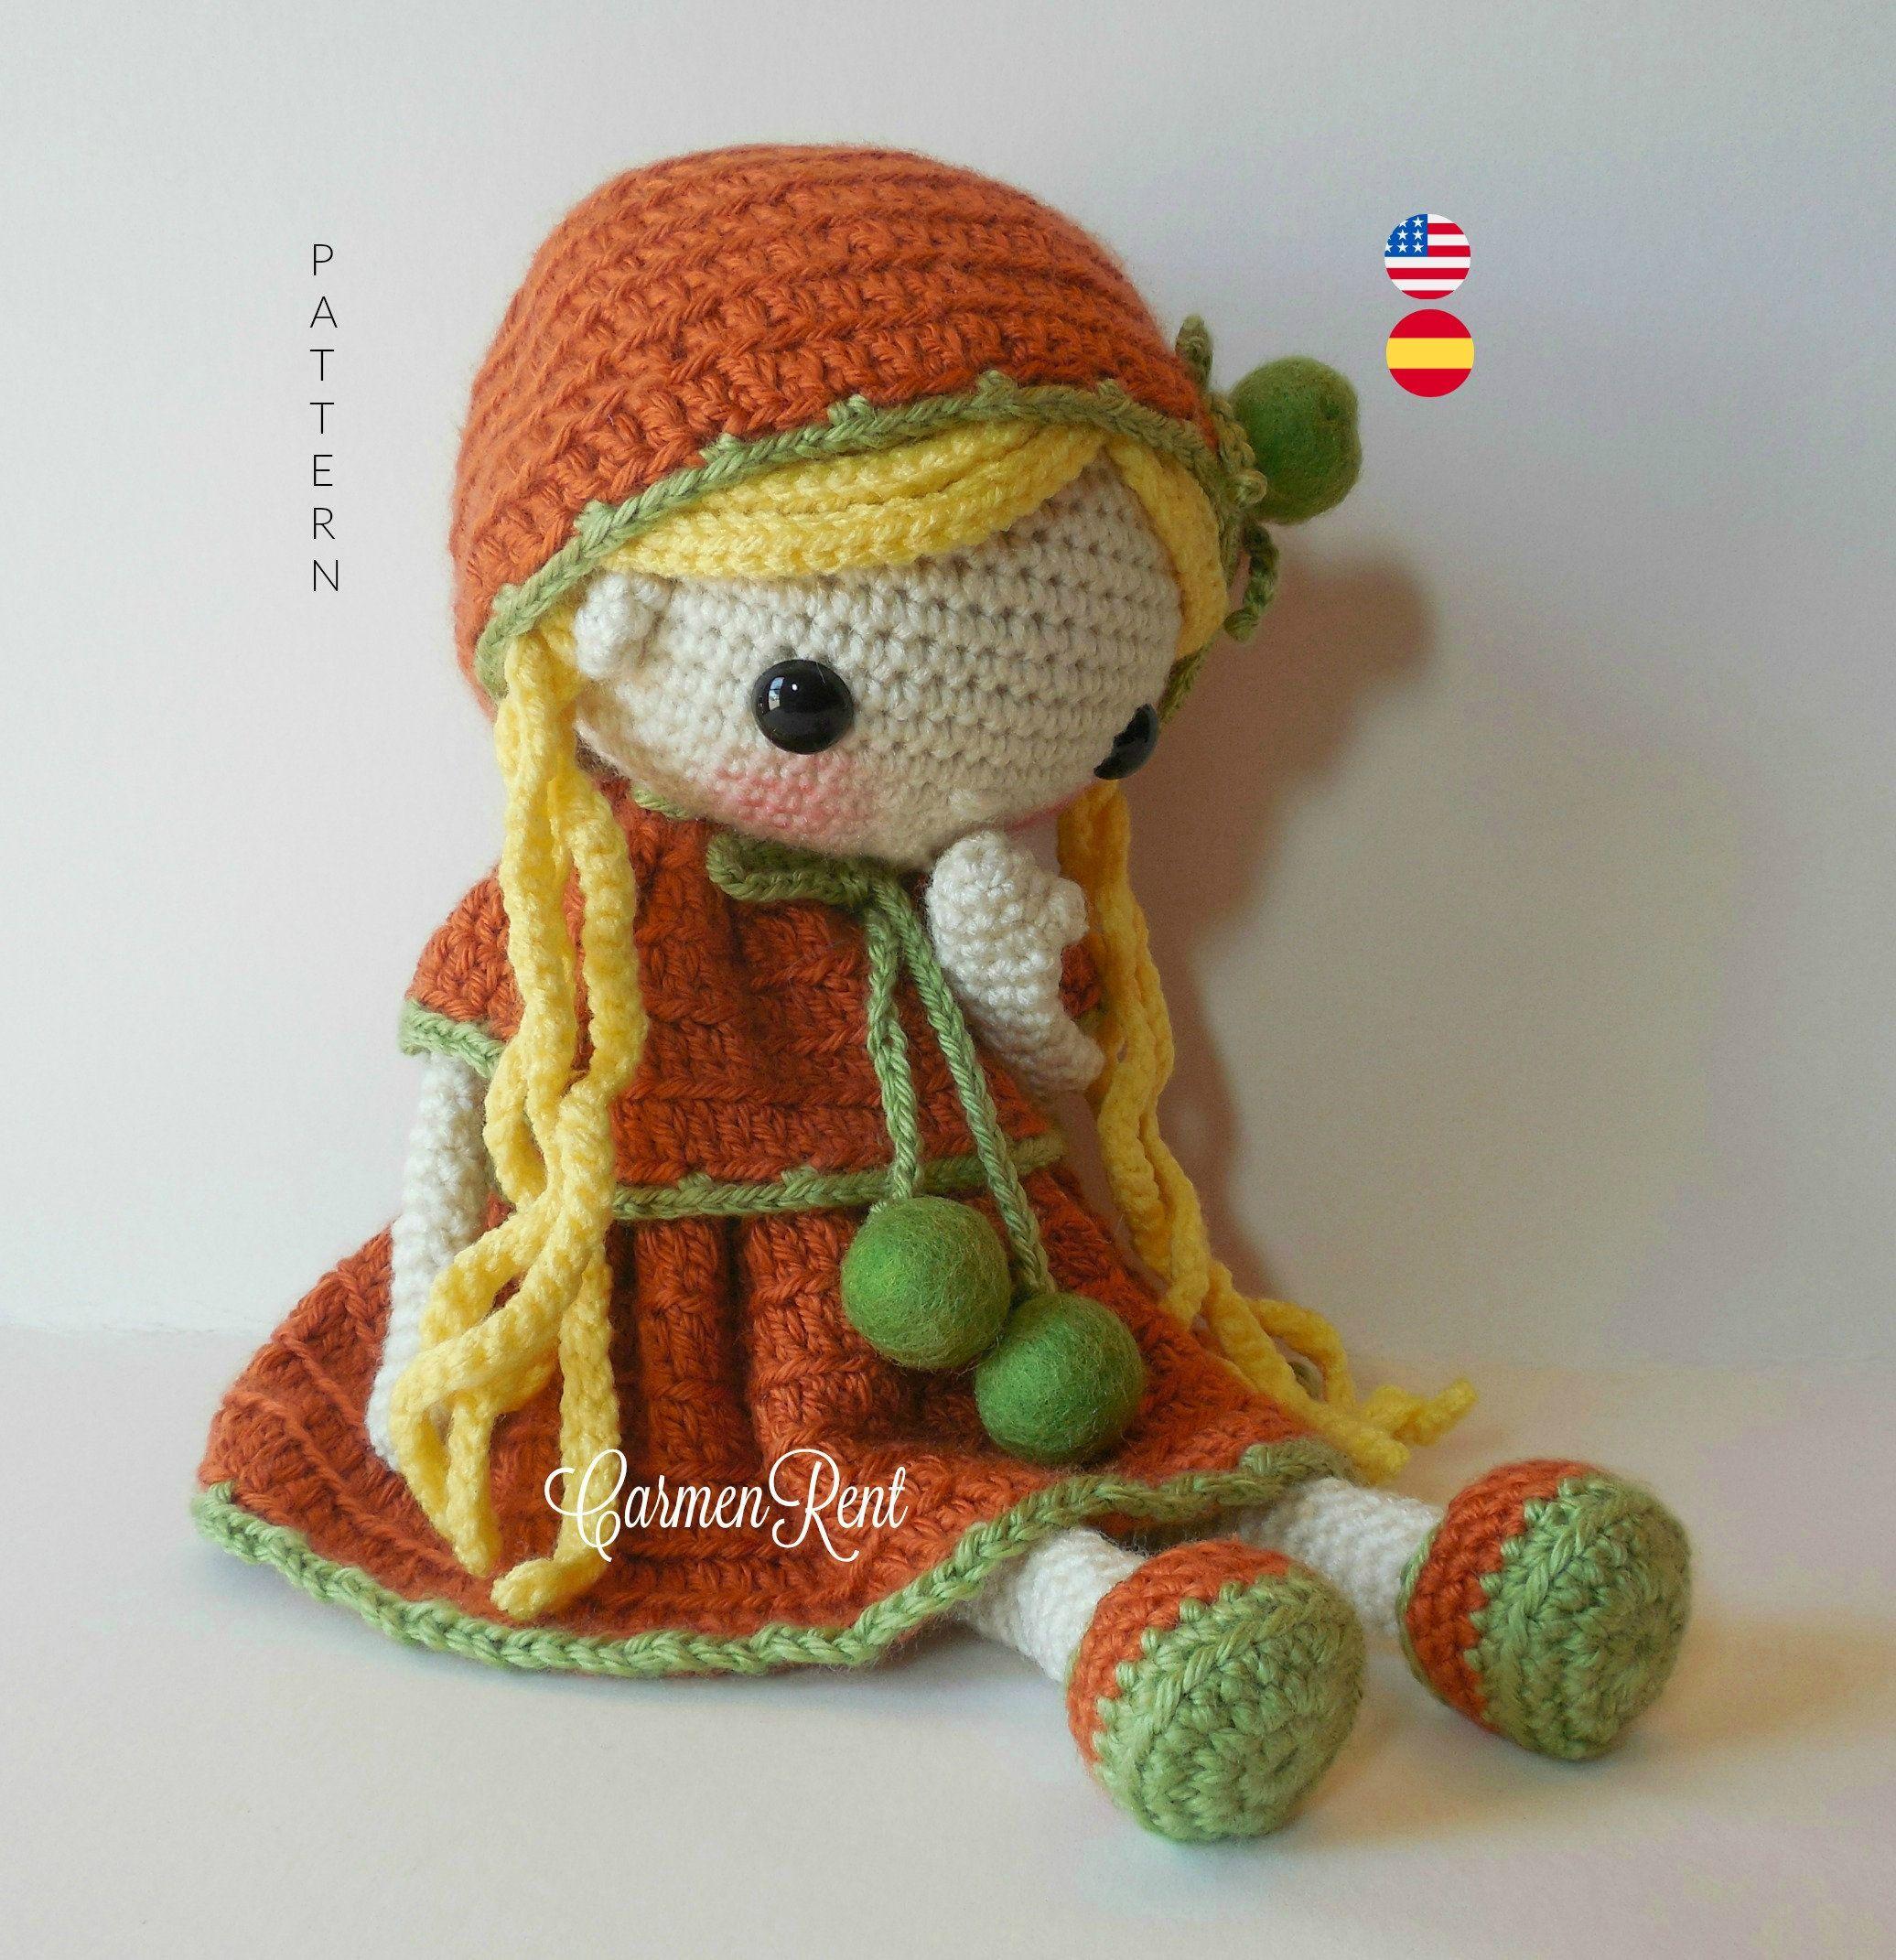 How to add Yarn Hair to Amigurumi Crochet Dolls with Hair Cap ... | 2142x2072